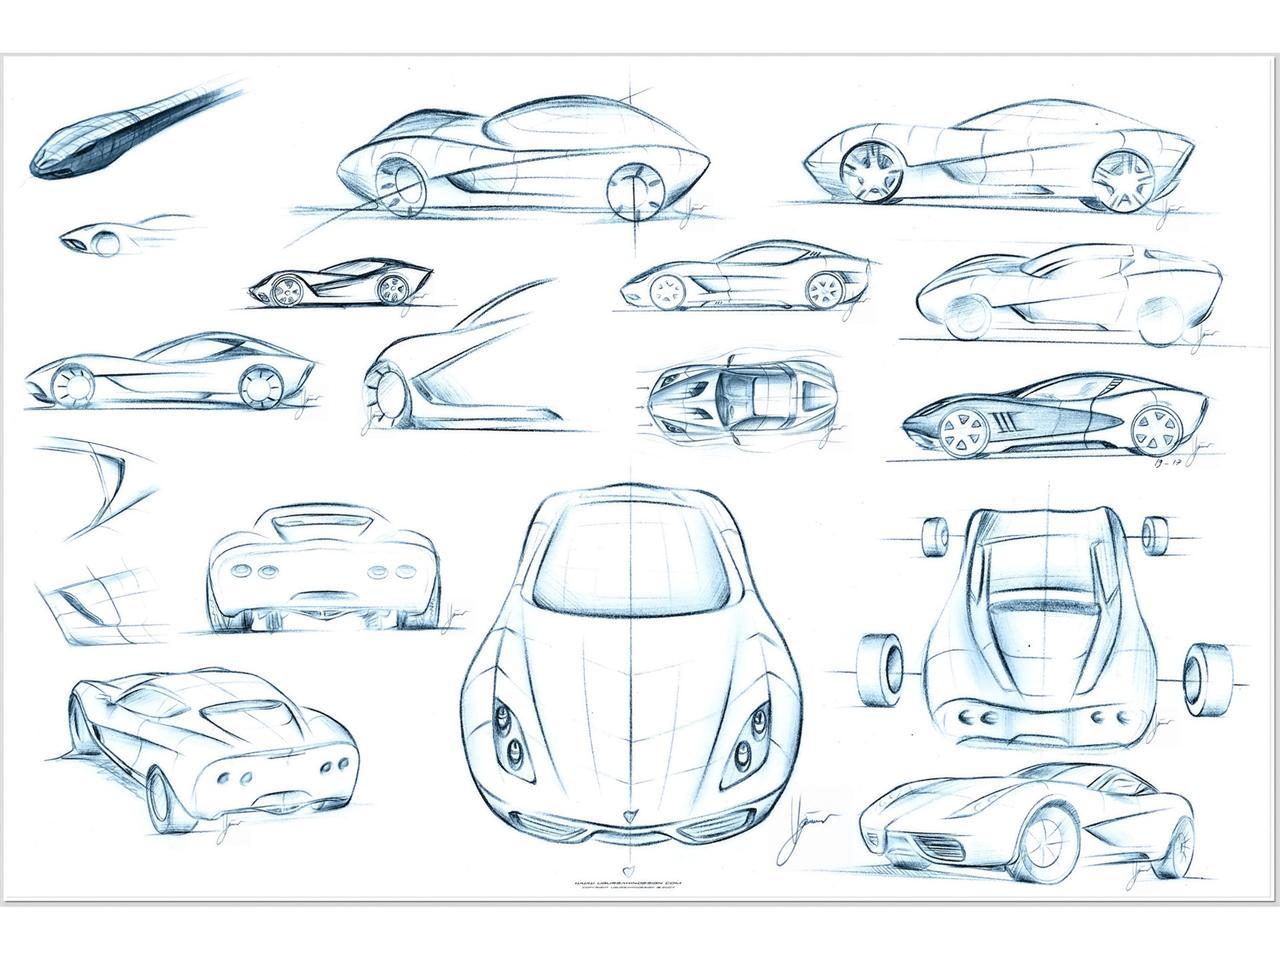 2009 Ugur Sahin Corvette Z03 Concept